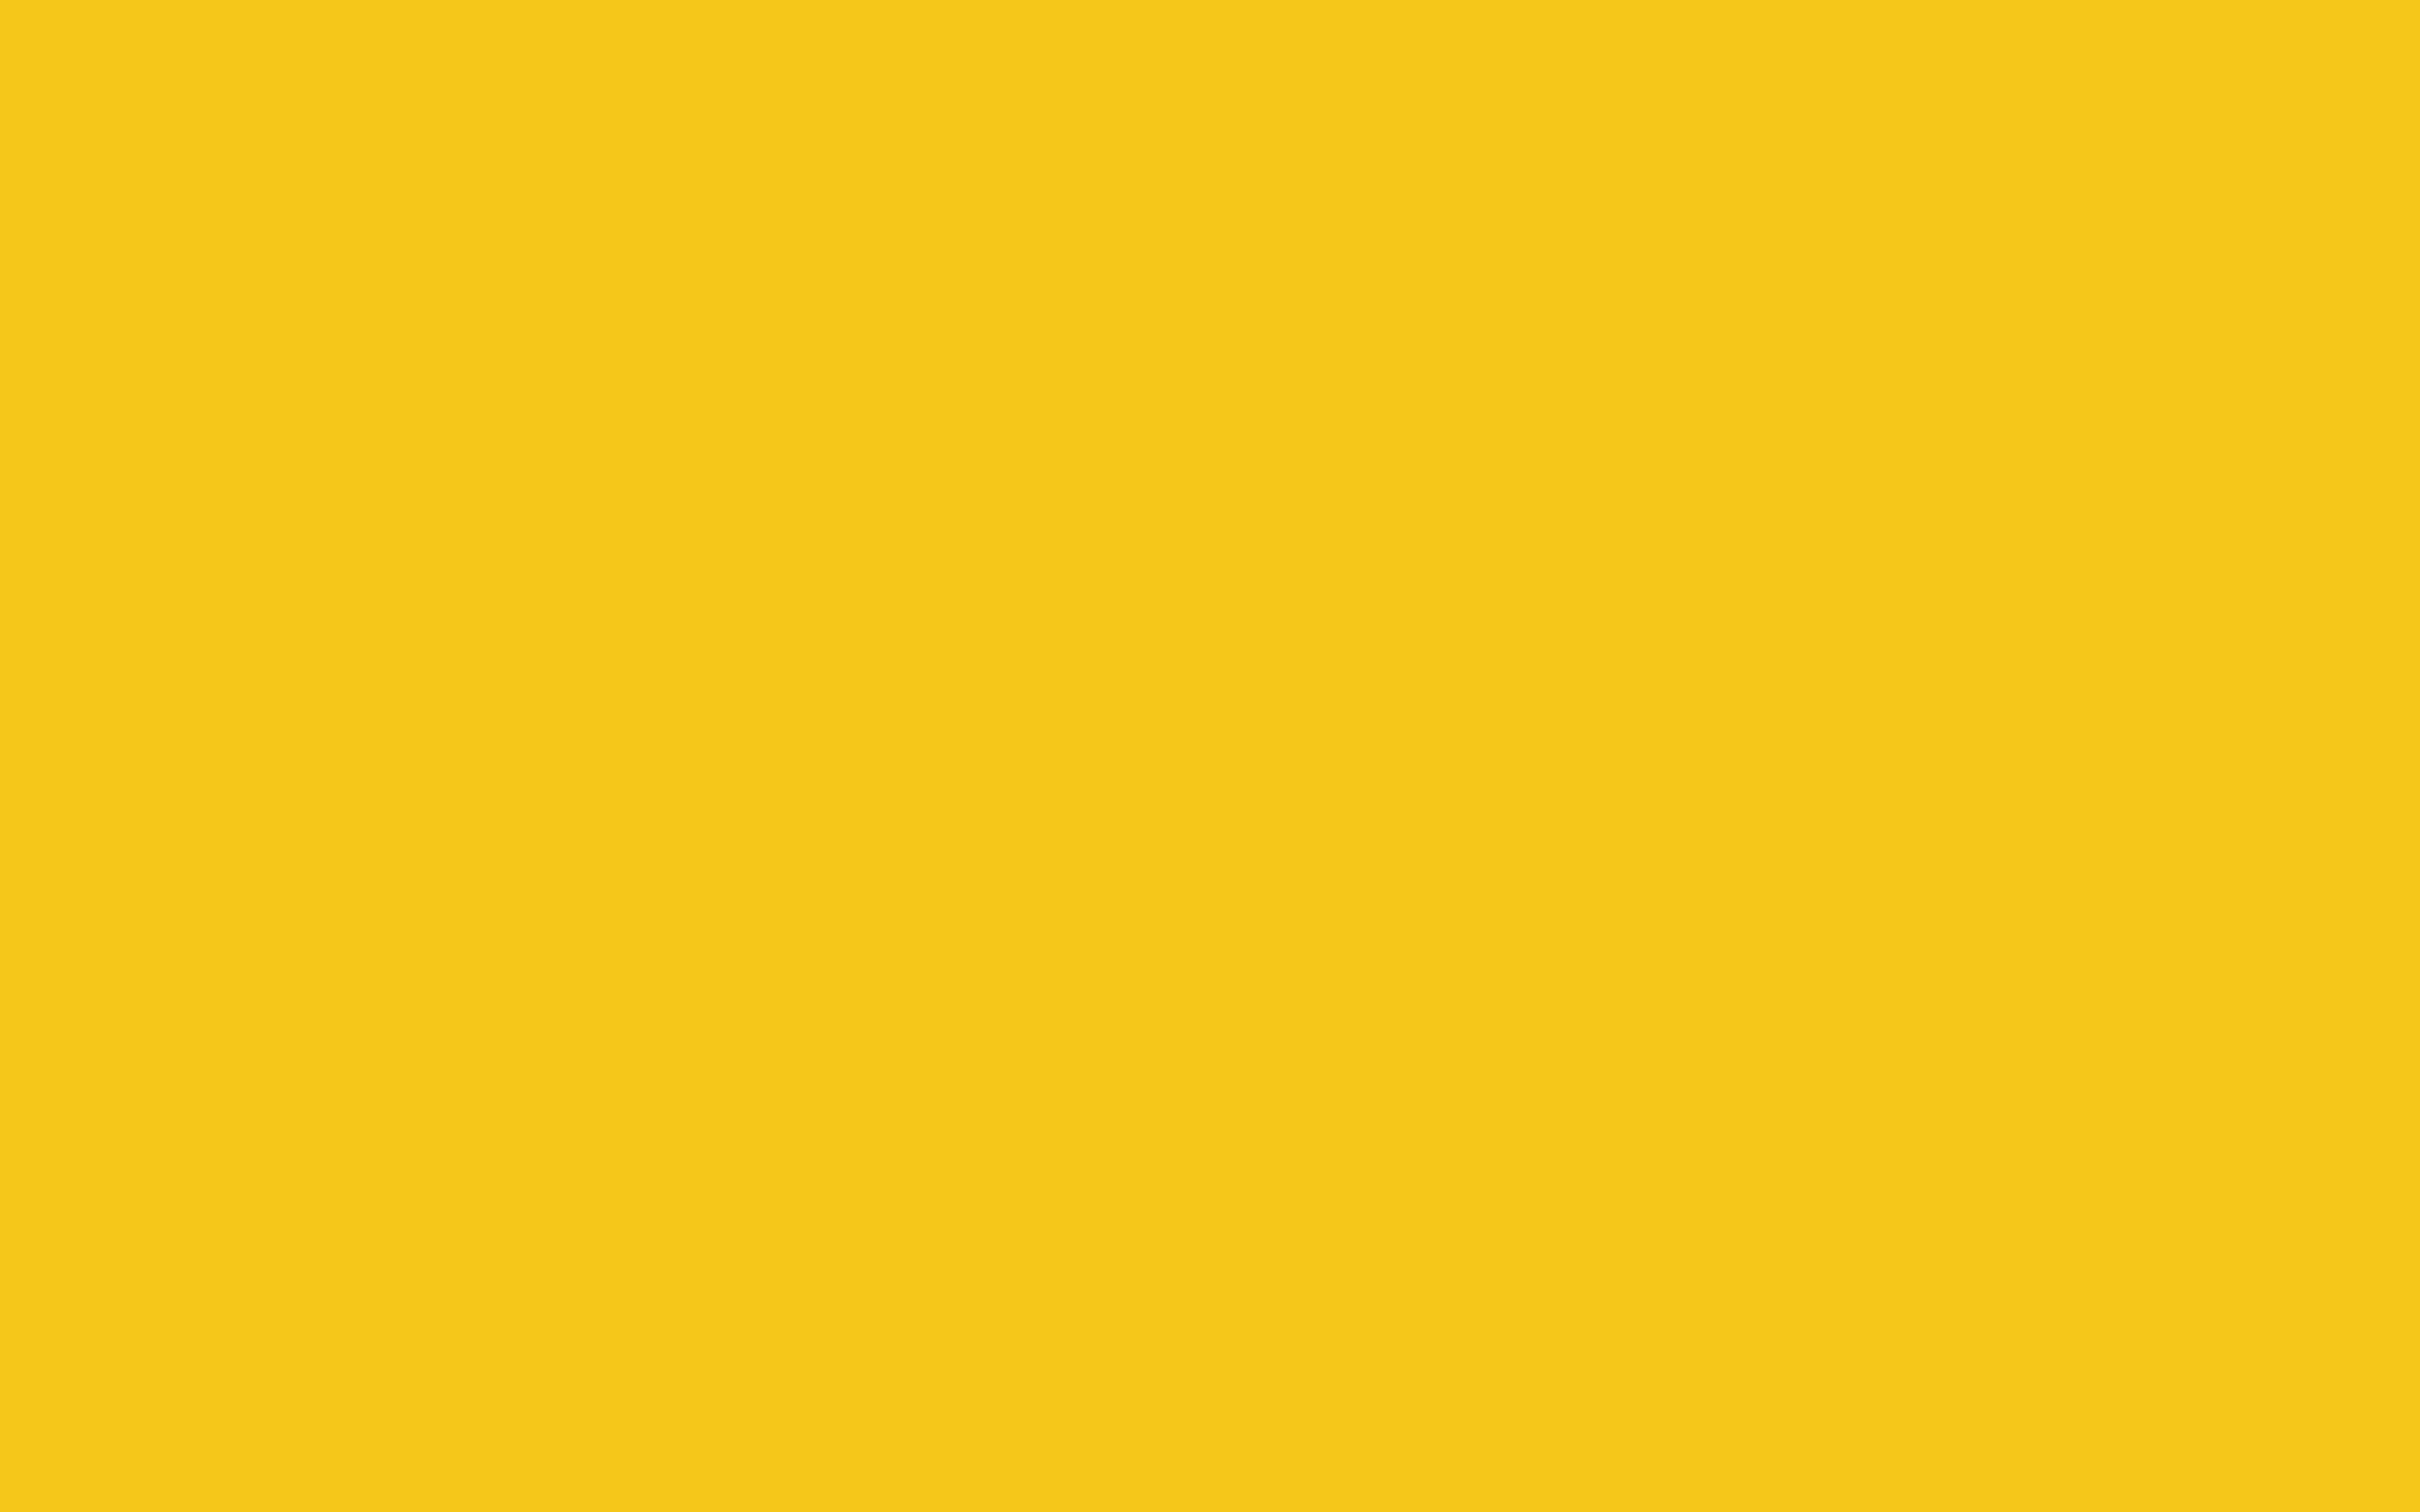 2560x1600 Deep Lemon Solid Color Background